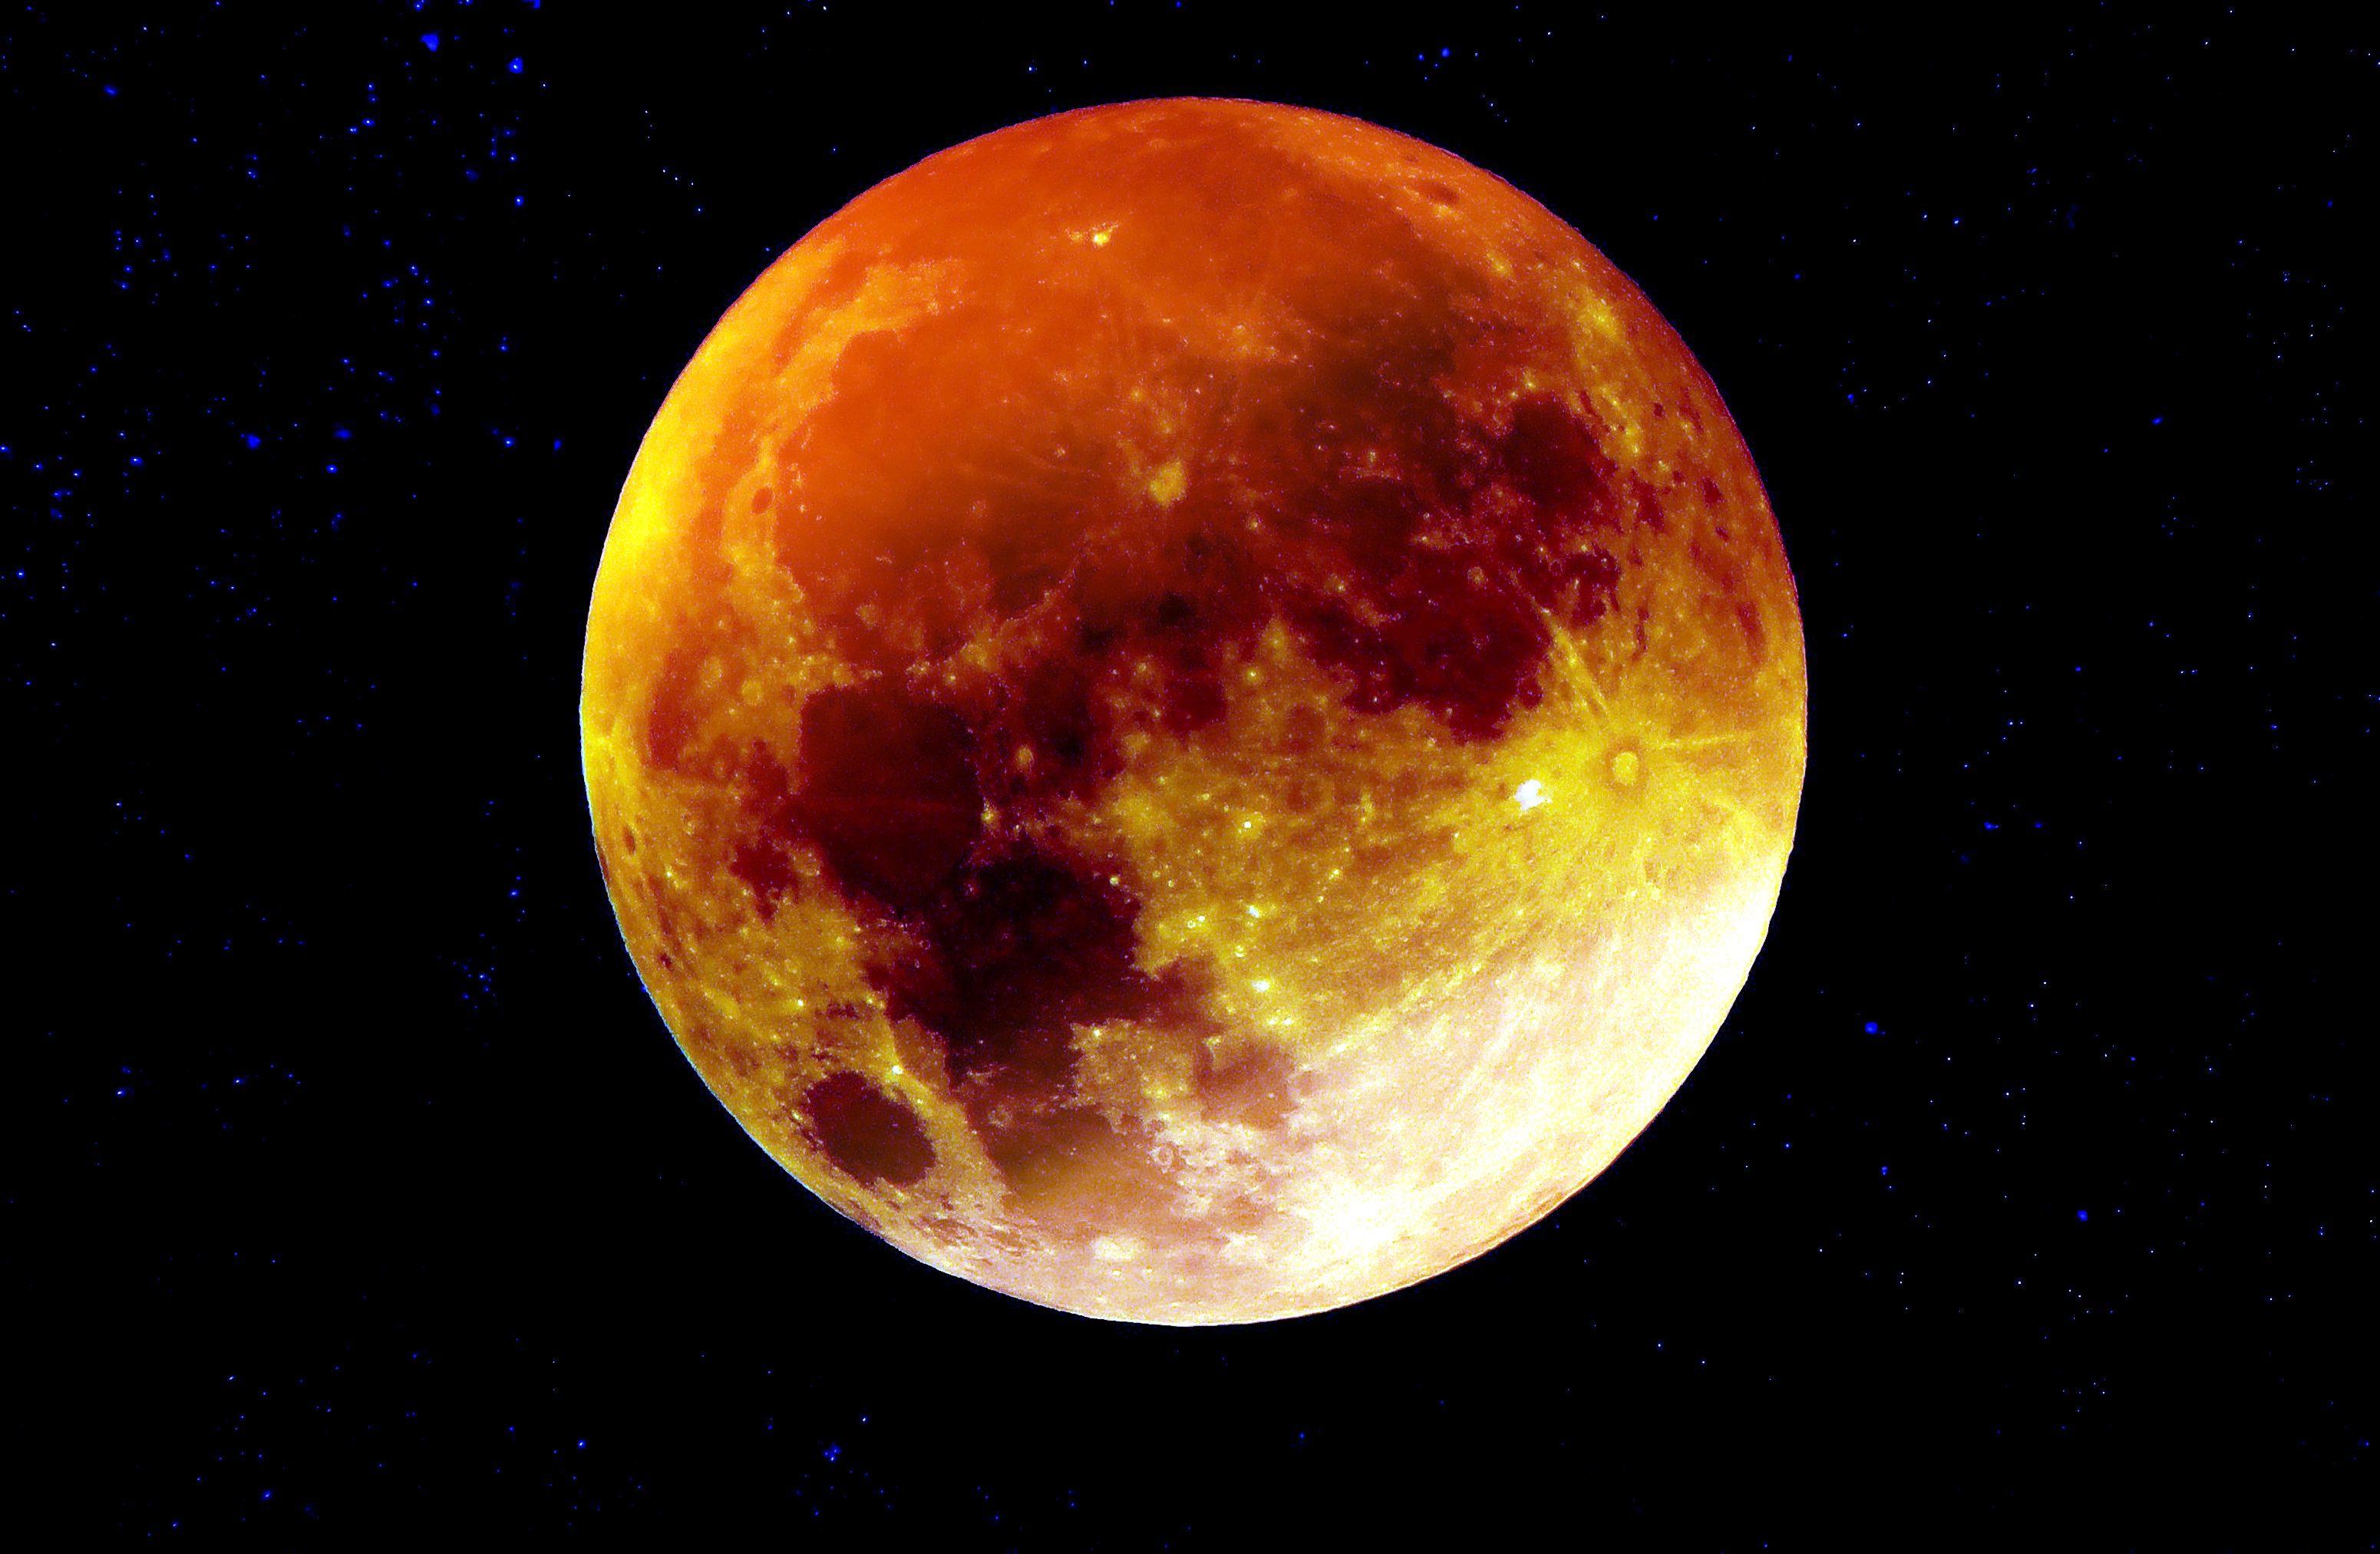 Universe Wallpaper Hd Free Picture Moon Universe